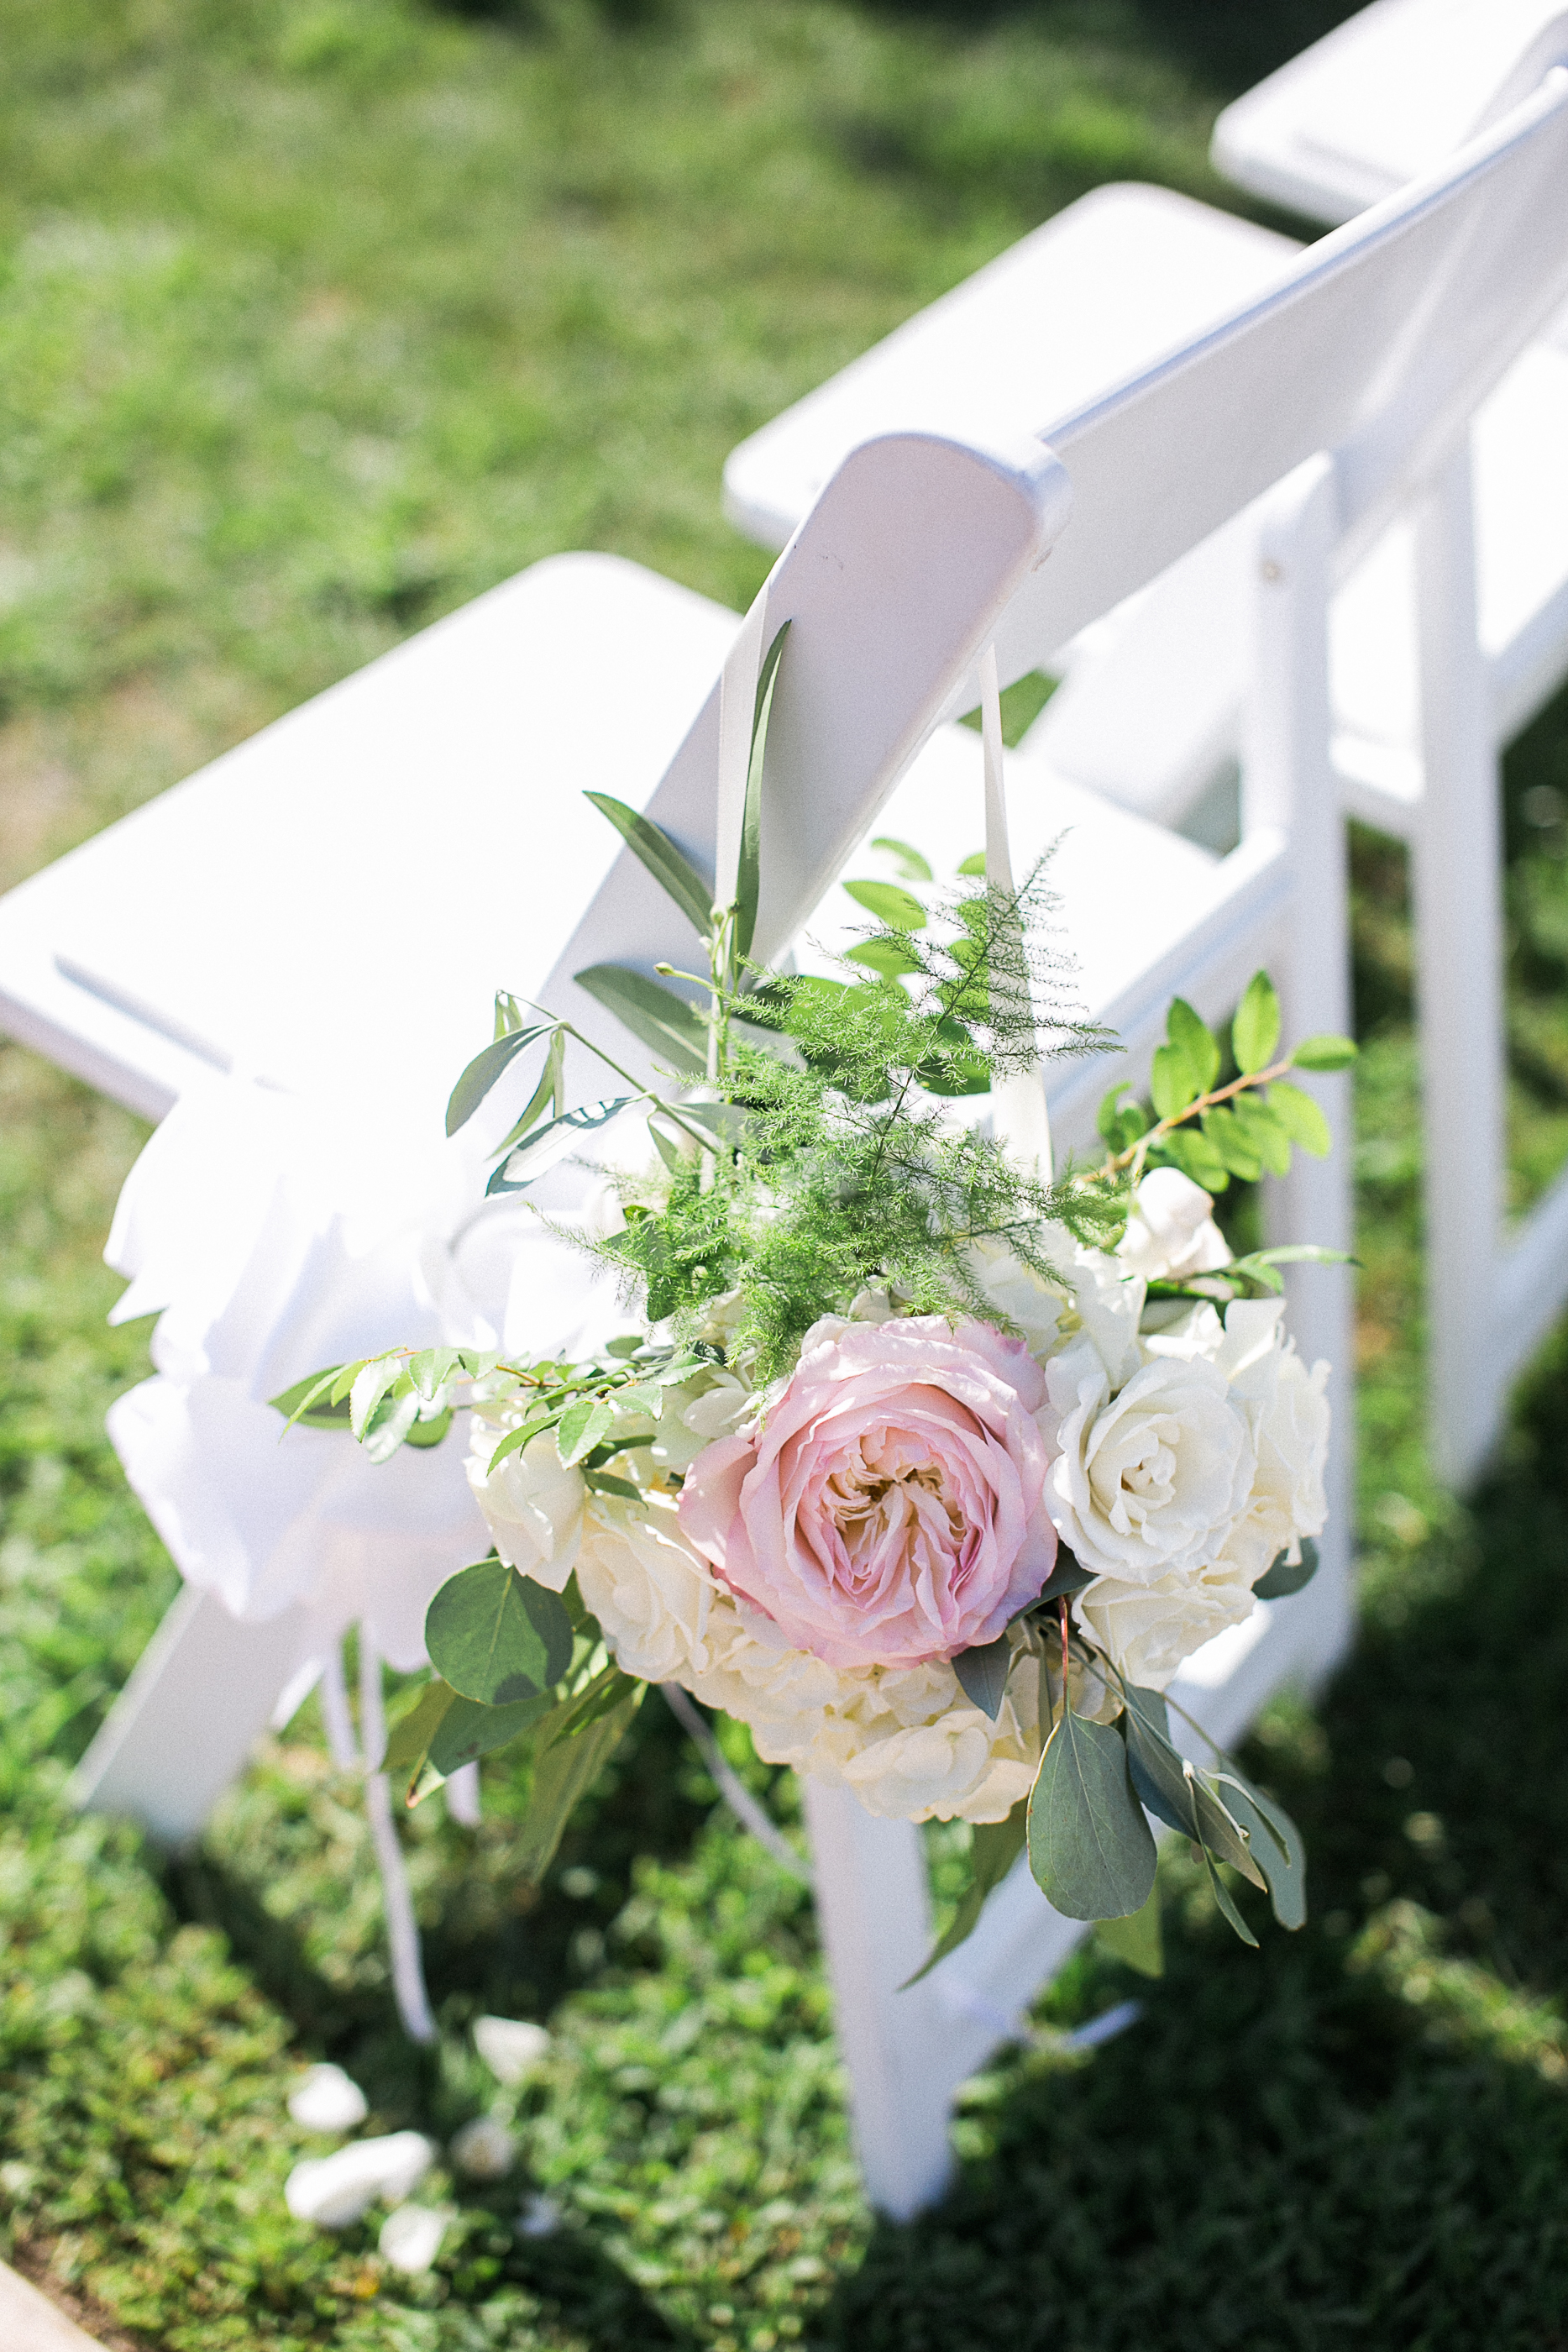 Blush & ivory ceremony aisle decor by San Diego Florist, Compass Floral.  Brandi Welles Photography